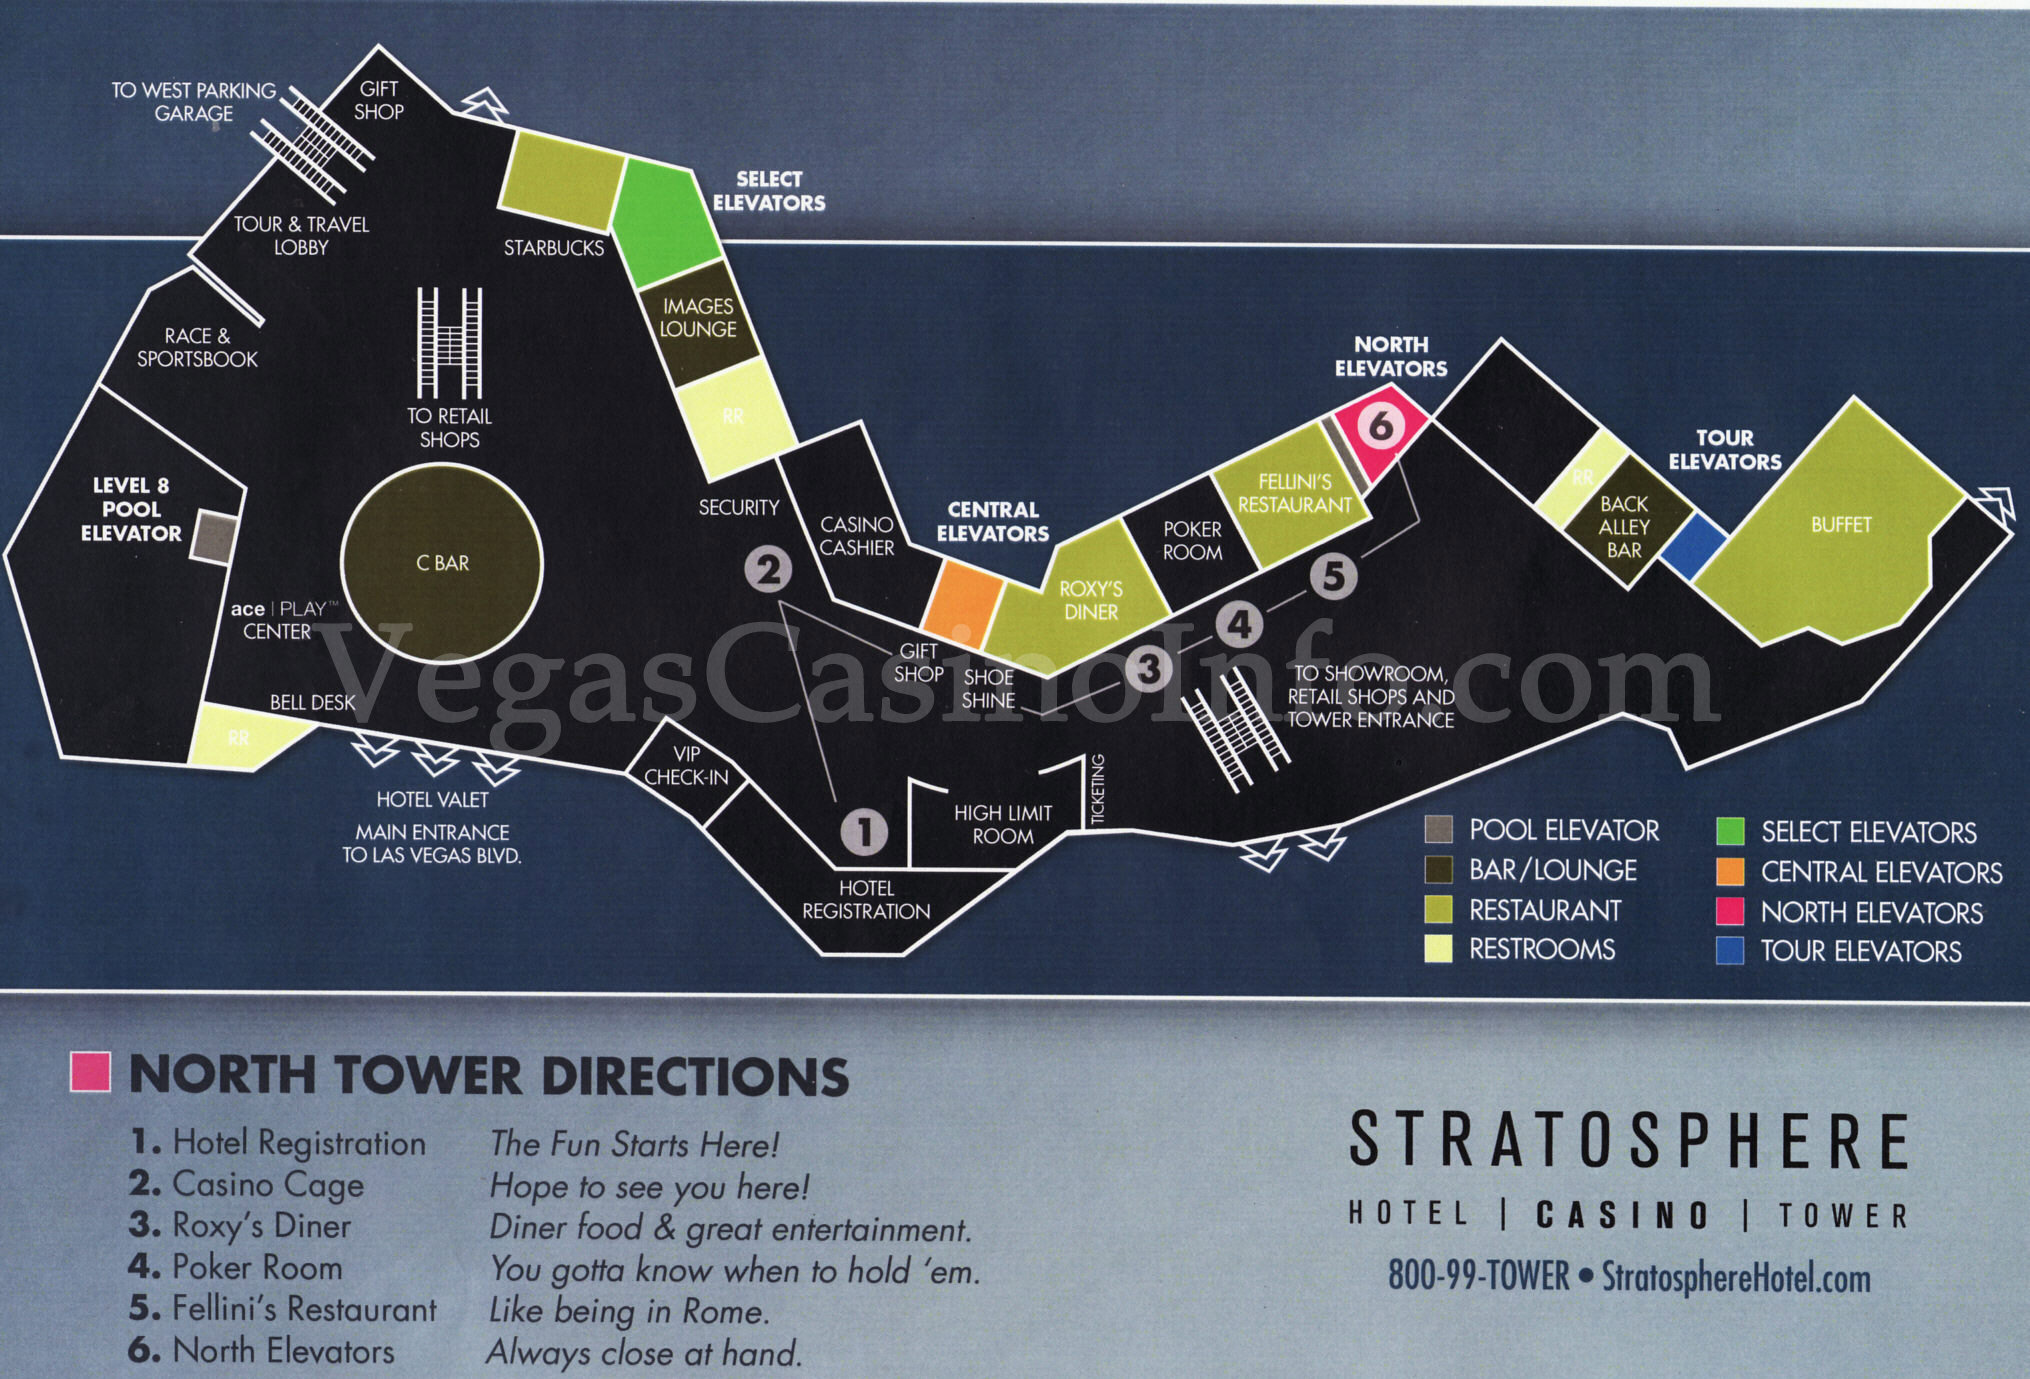 Us casino locations